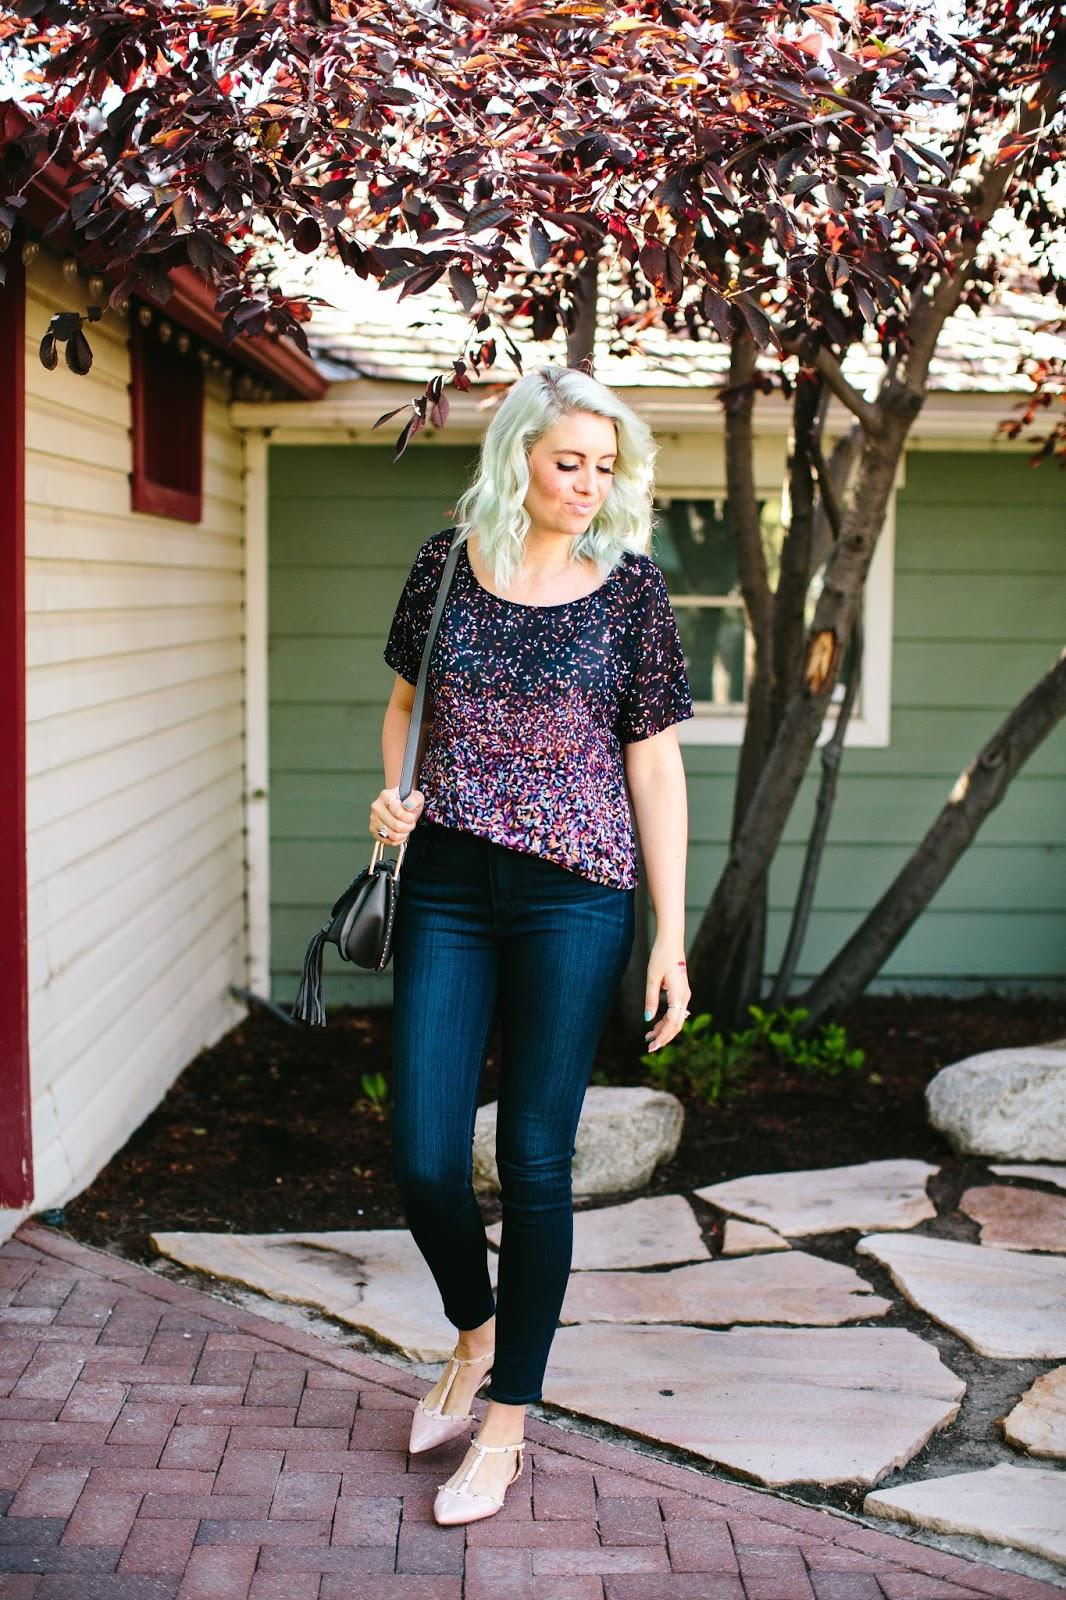 Le Tote, Clothing Subscription, Utah Fashion Blogger 8